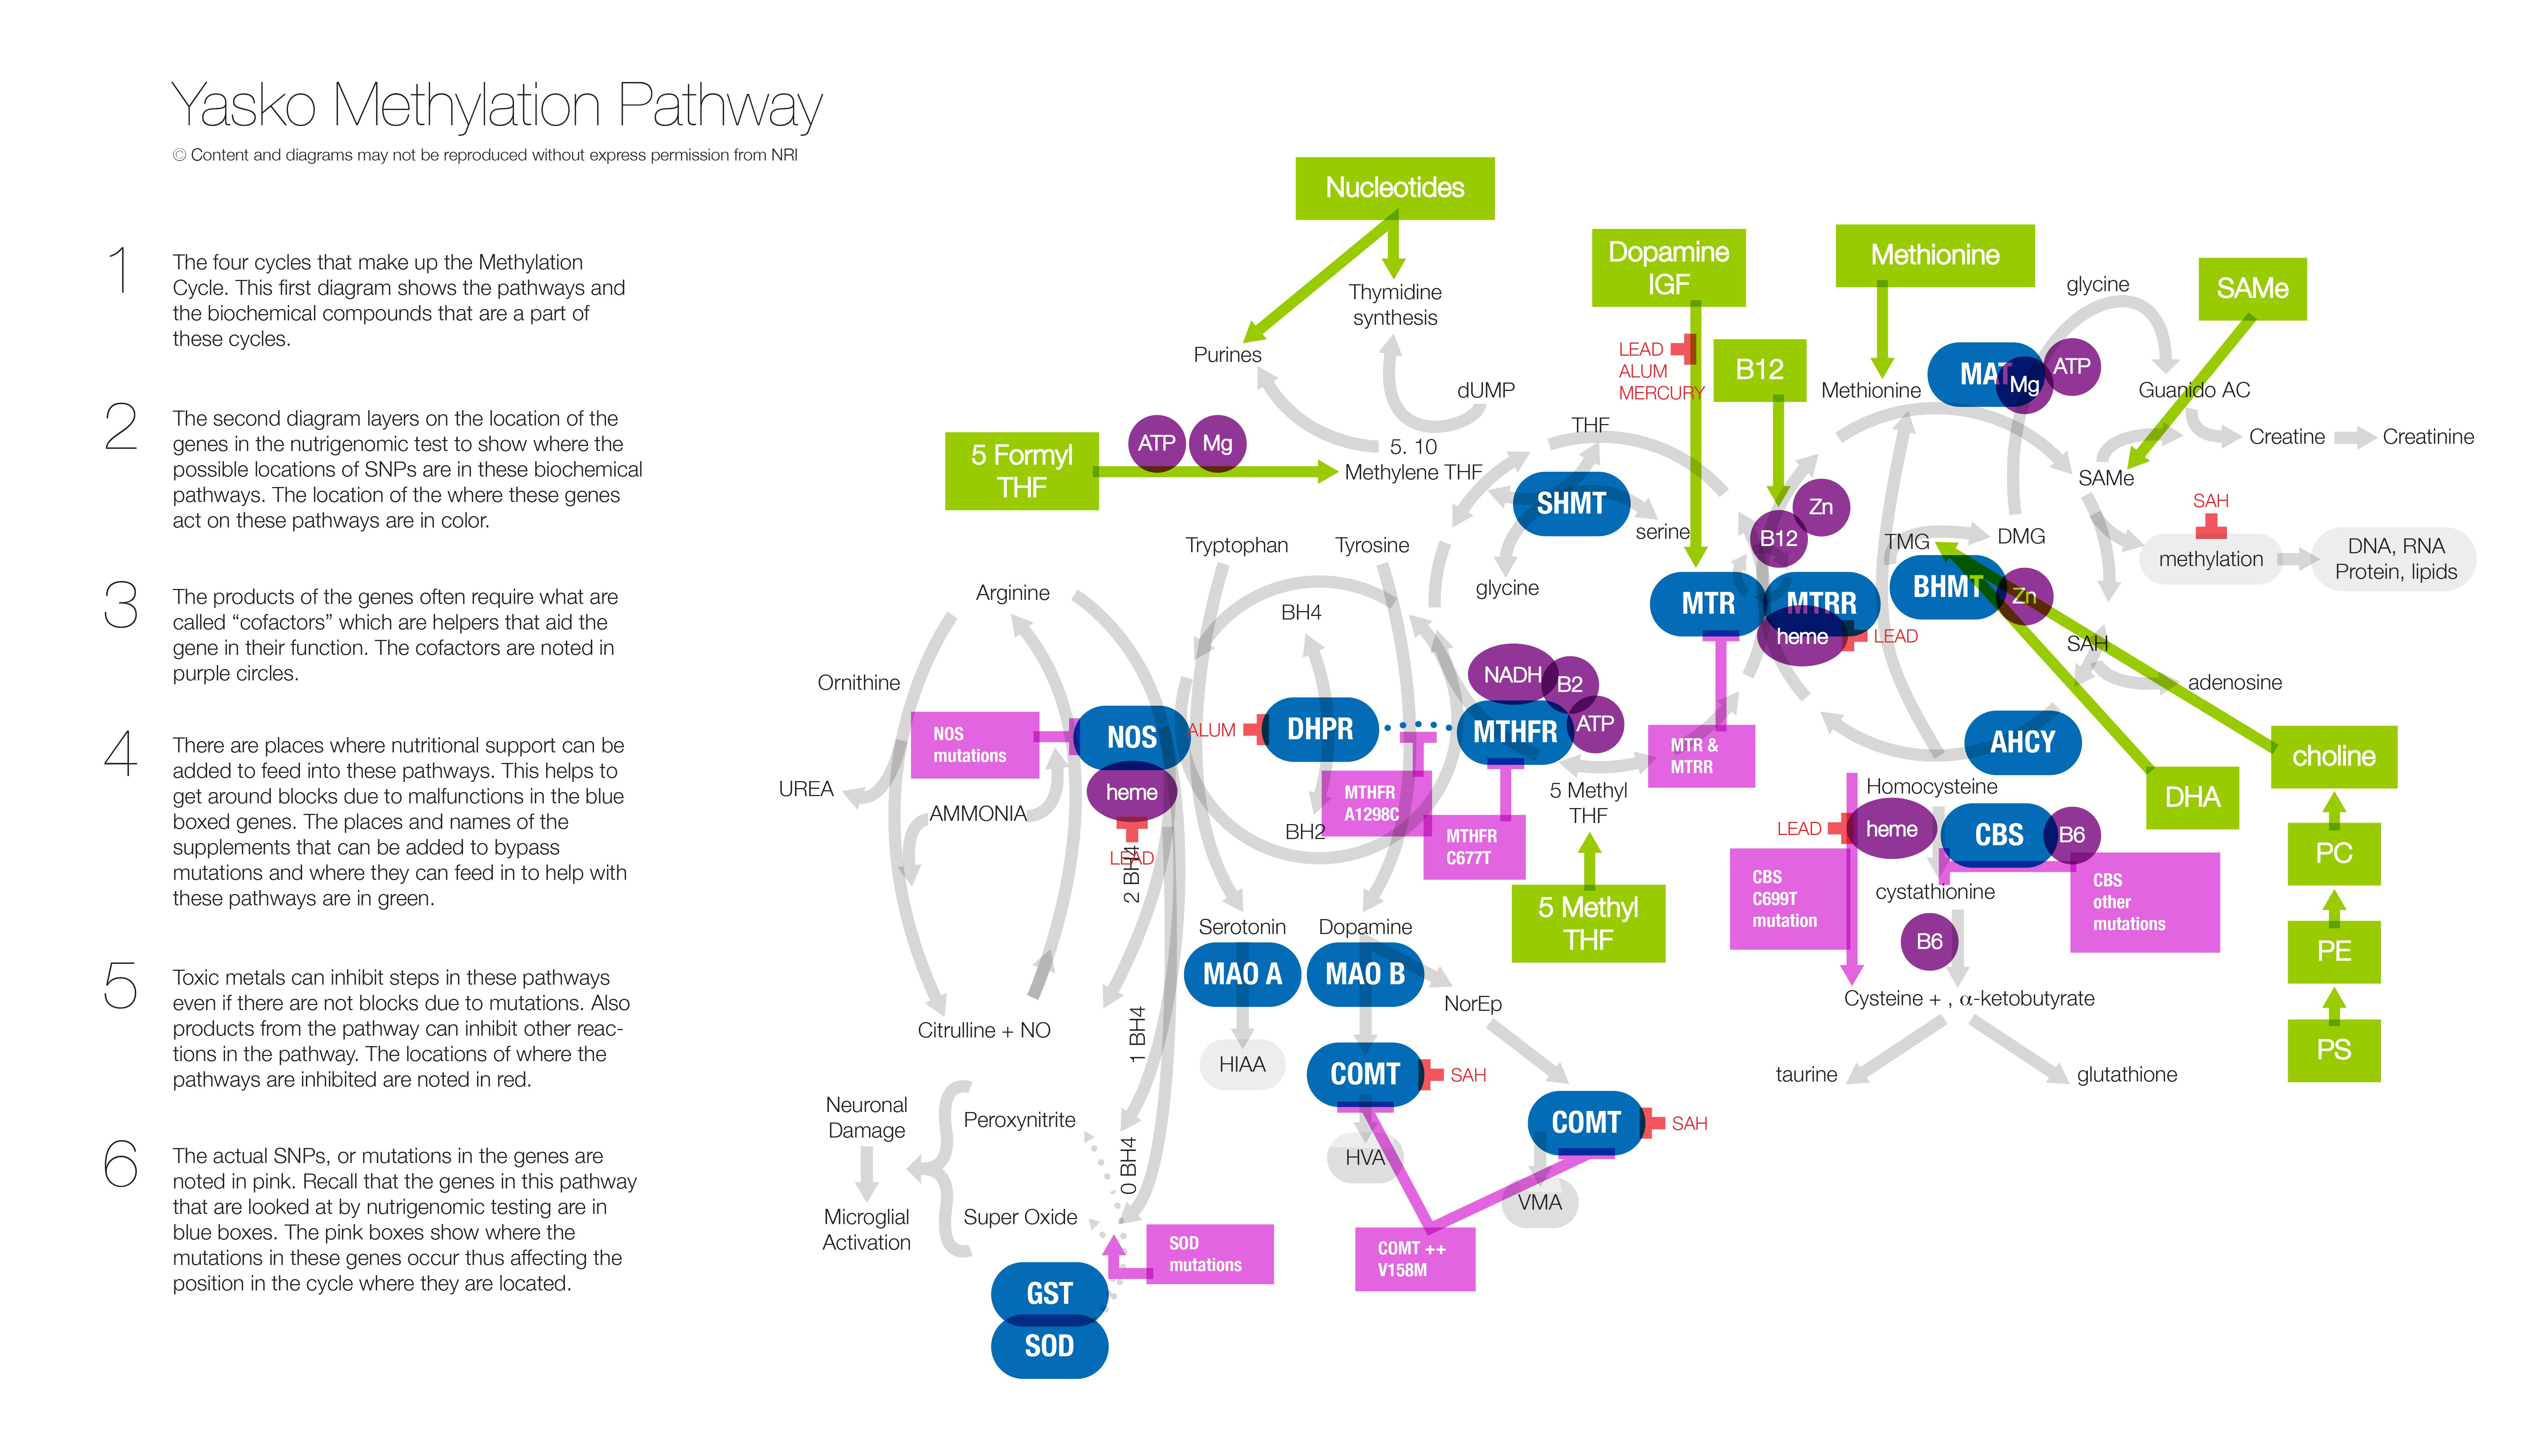 Yasko Methylation Pathway - 6